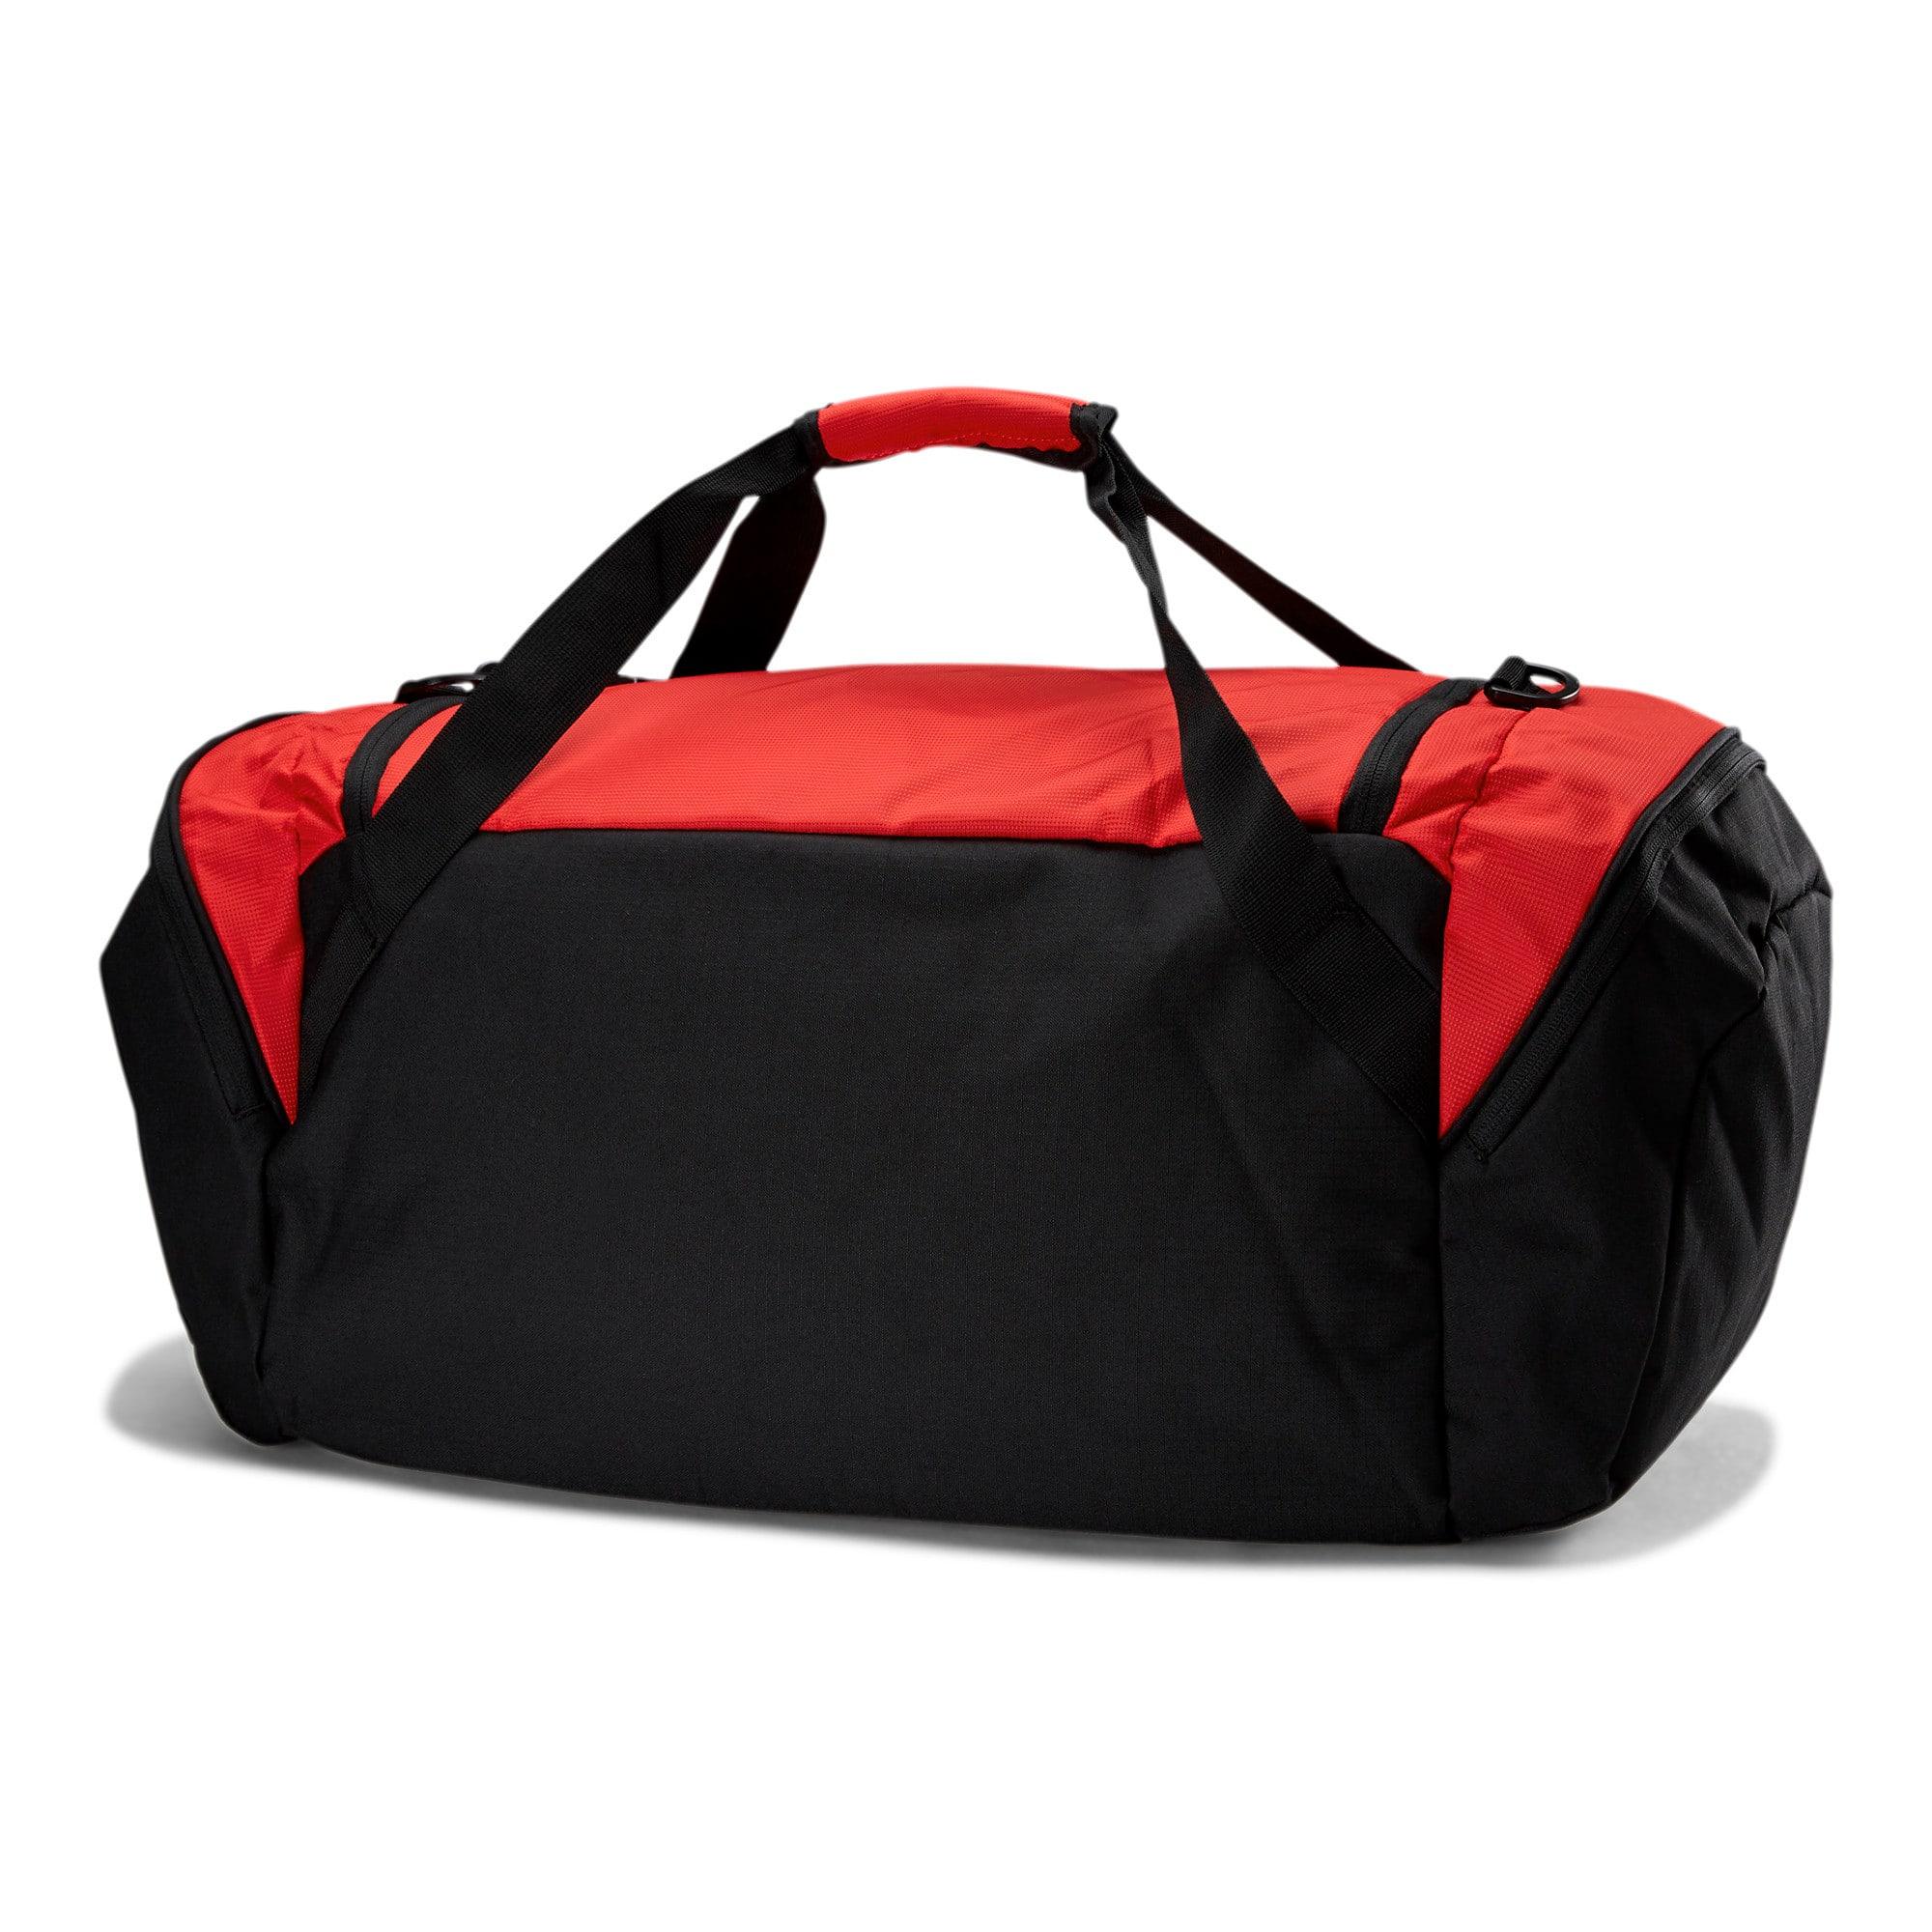 "Thumbnail 2 of Formation 2.0 24"" Duffel Bag, Medium Red, medium"